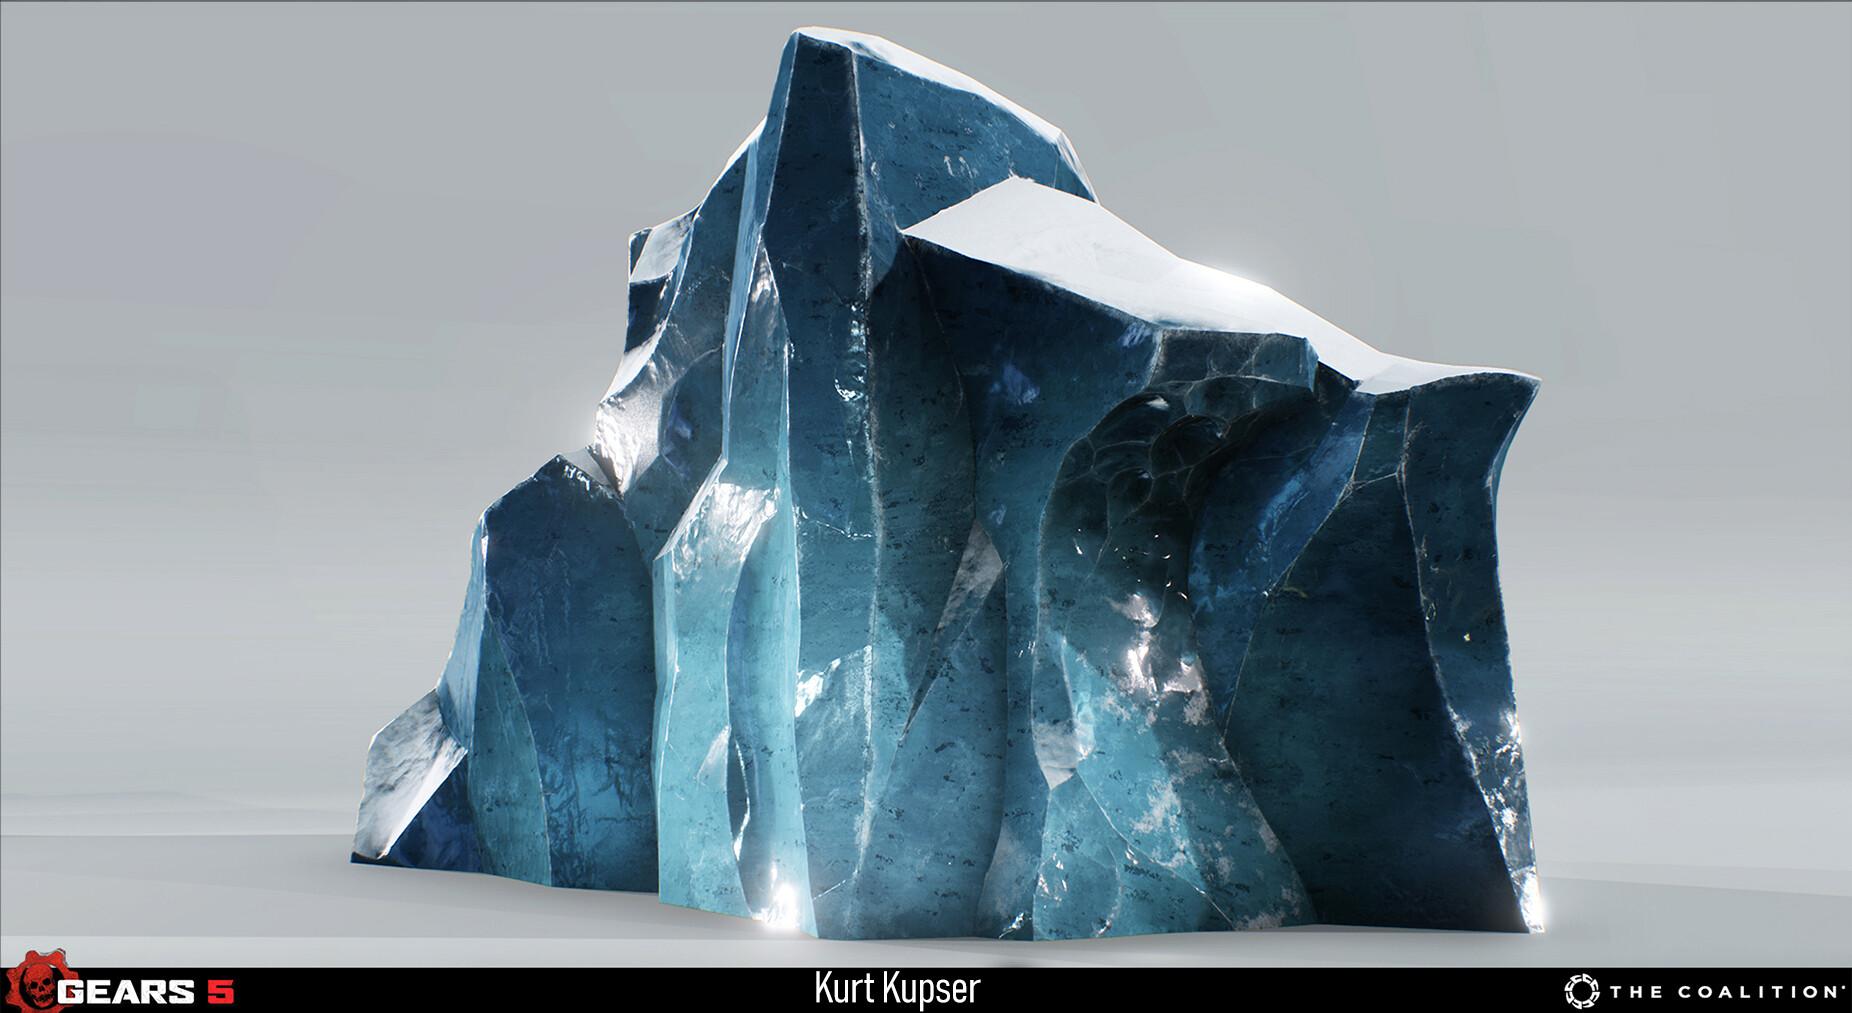 Ice Cliff asset made by Akio Kimoto https://www.artstation.com/kimoto